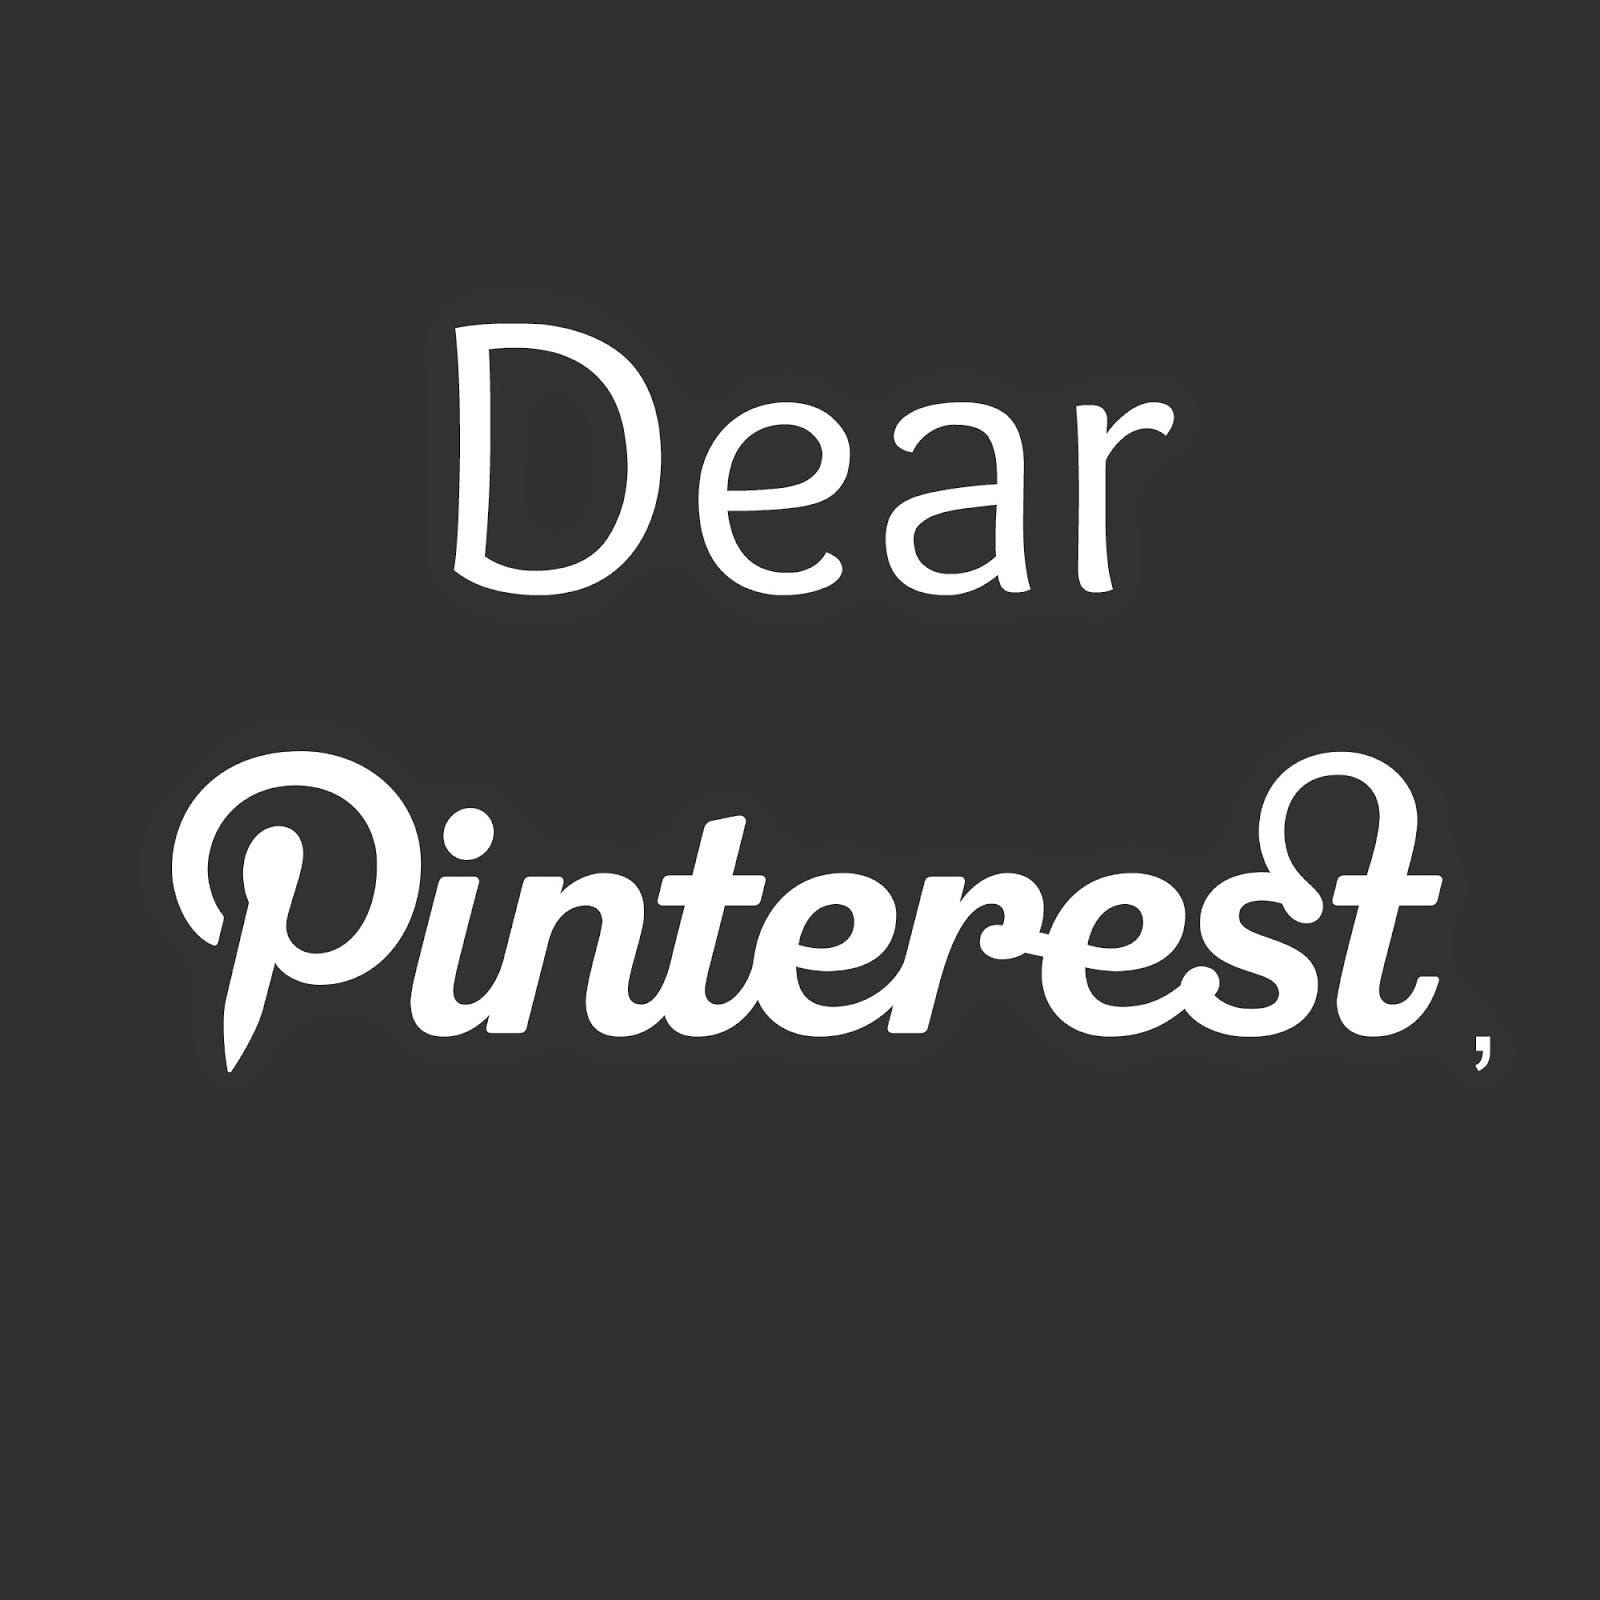 a Pinterest wish list